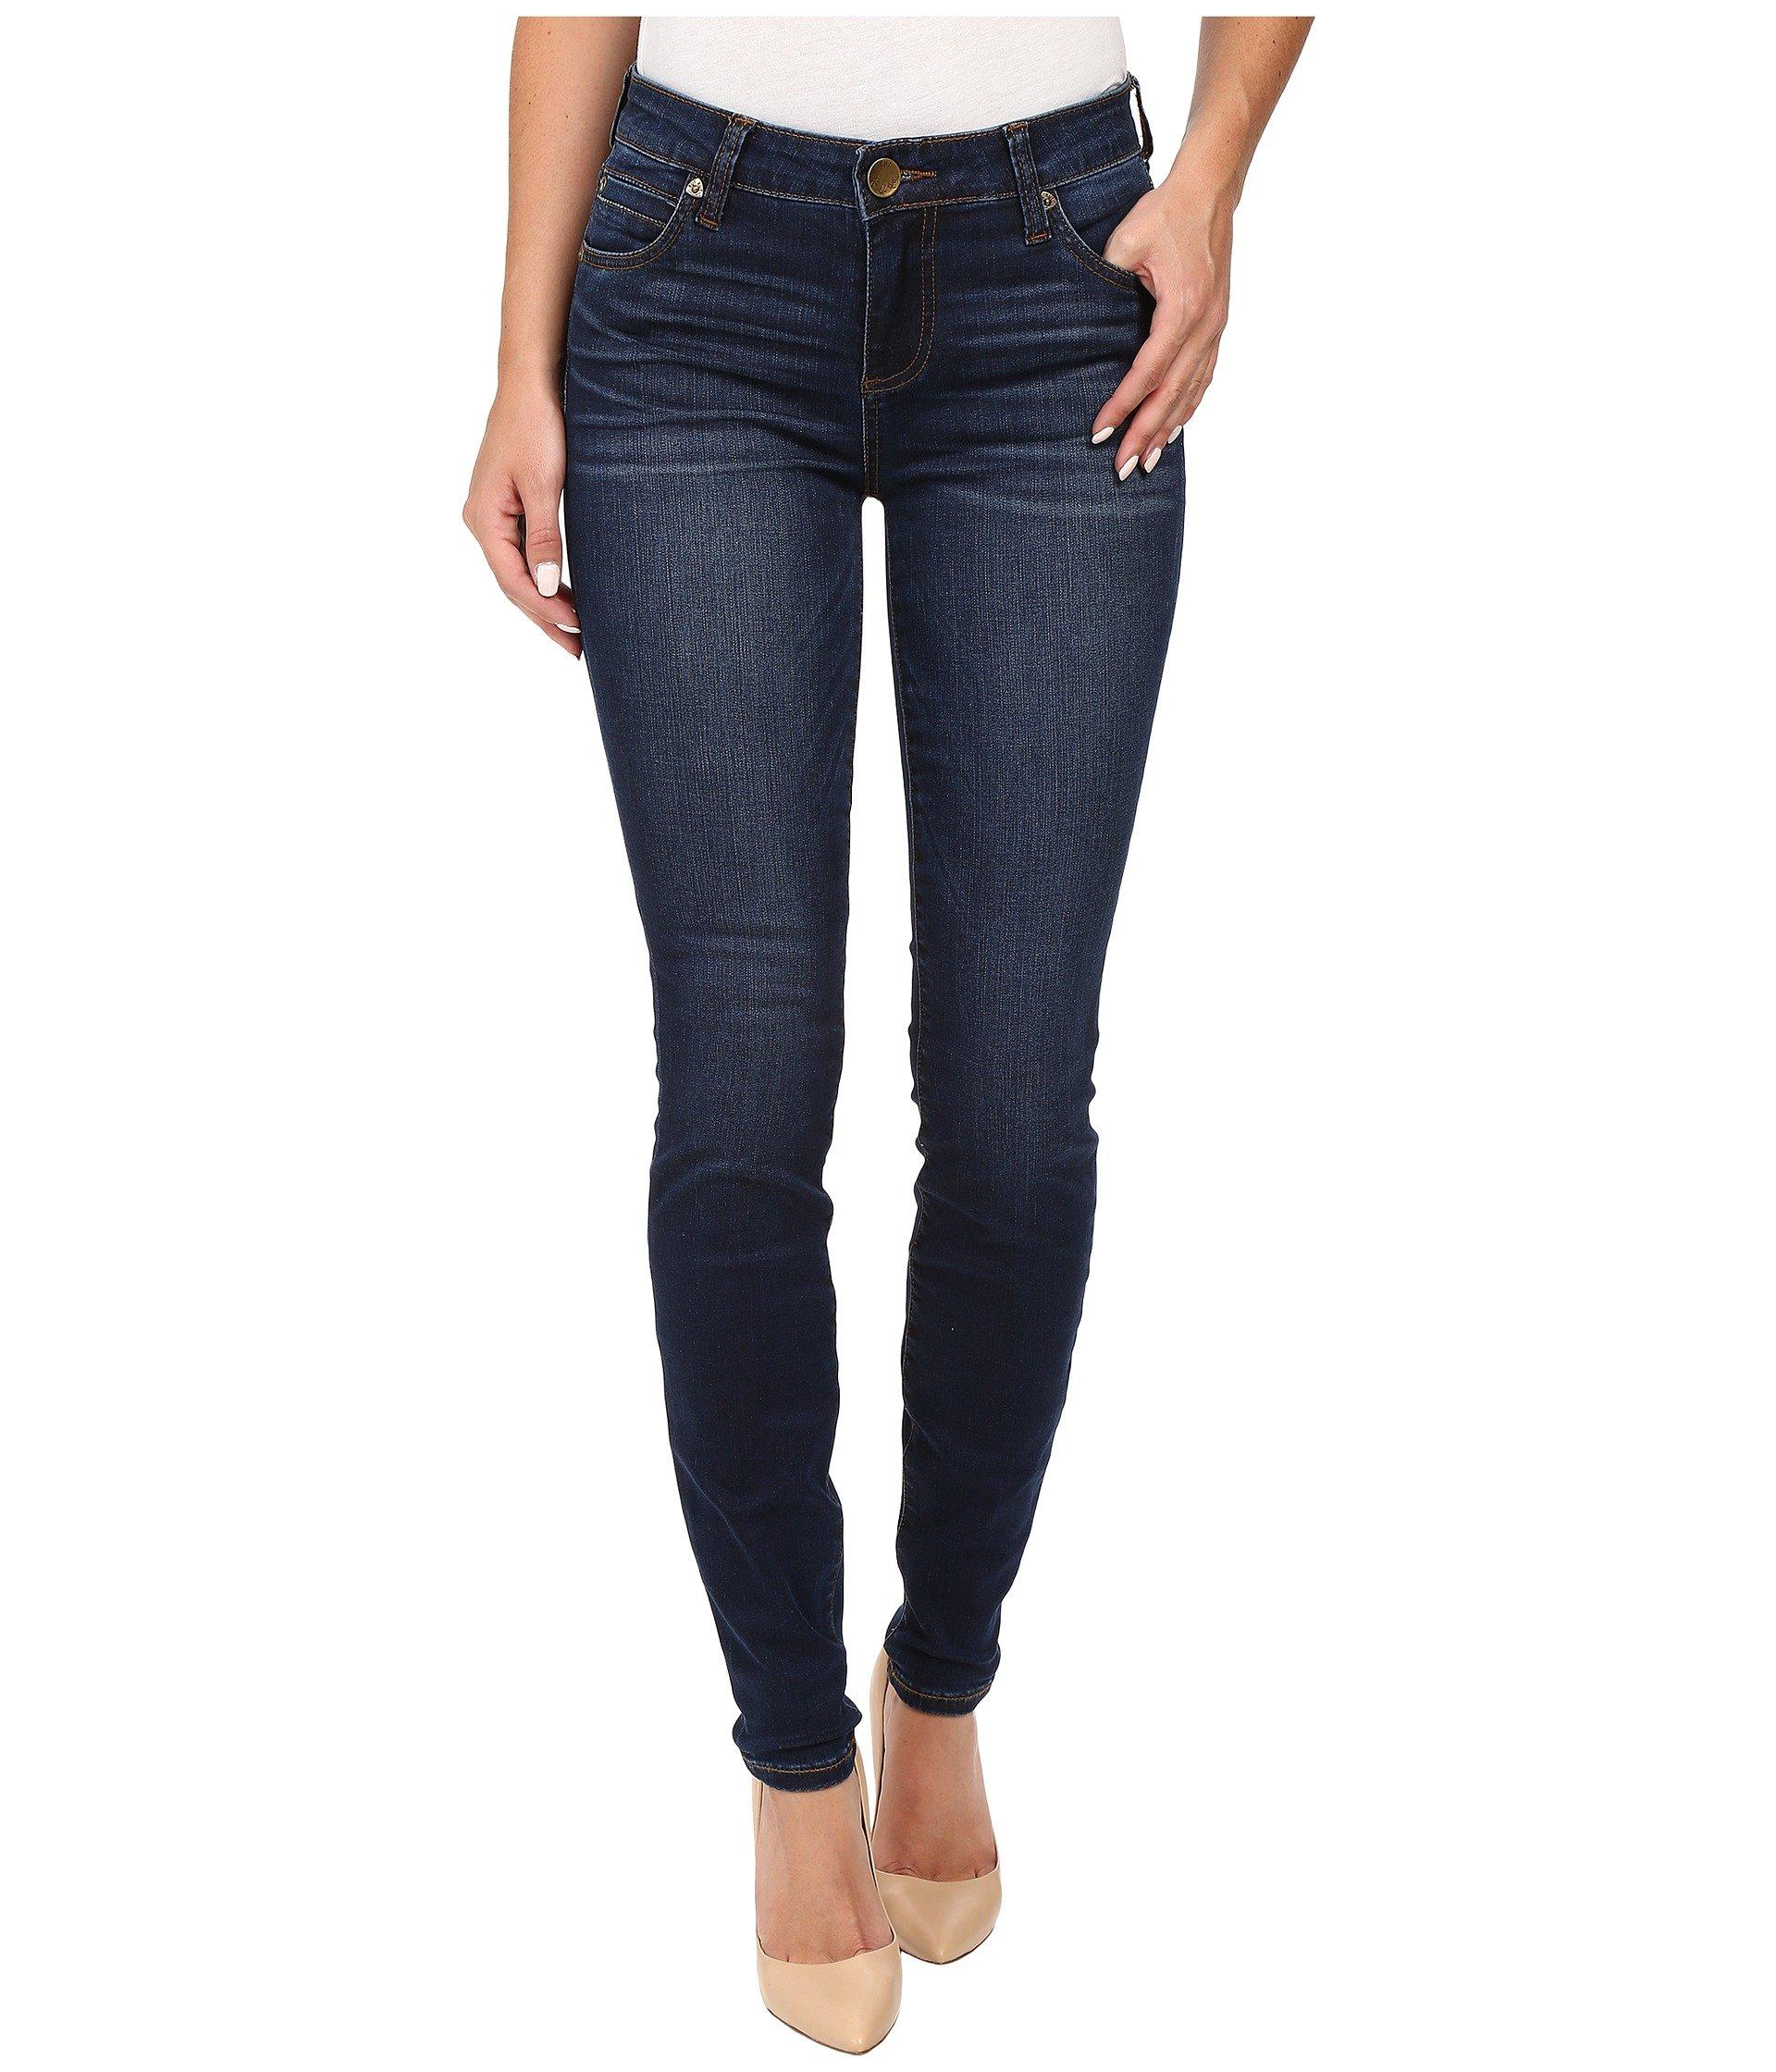 Mia Toothpick Five-Pocket Skinny Jeans in Awareness w/ Medium Base Wash